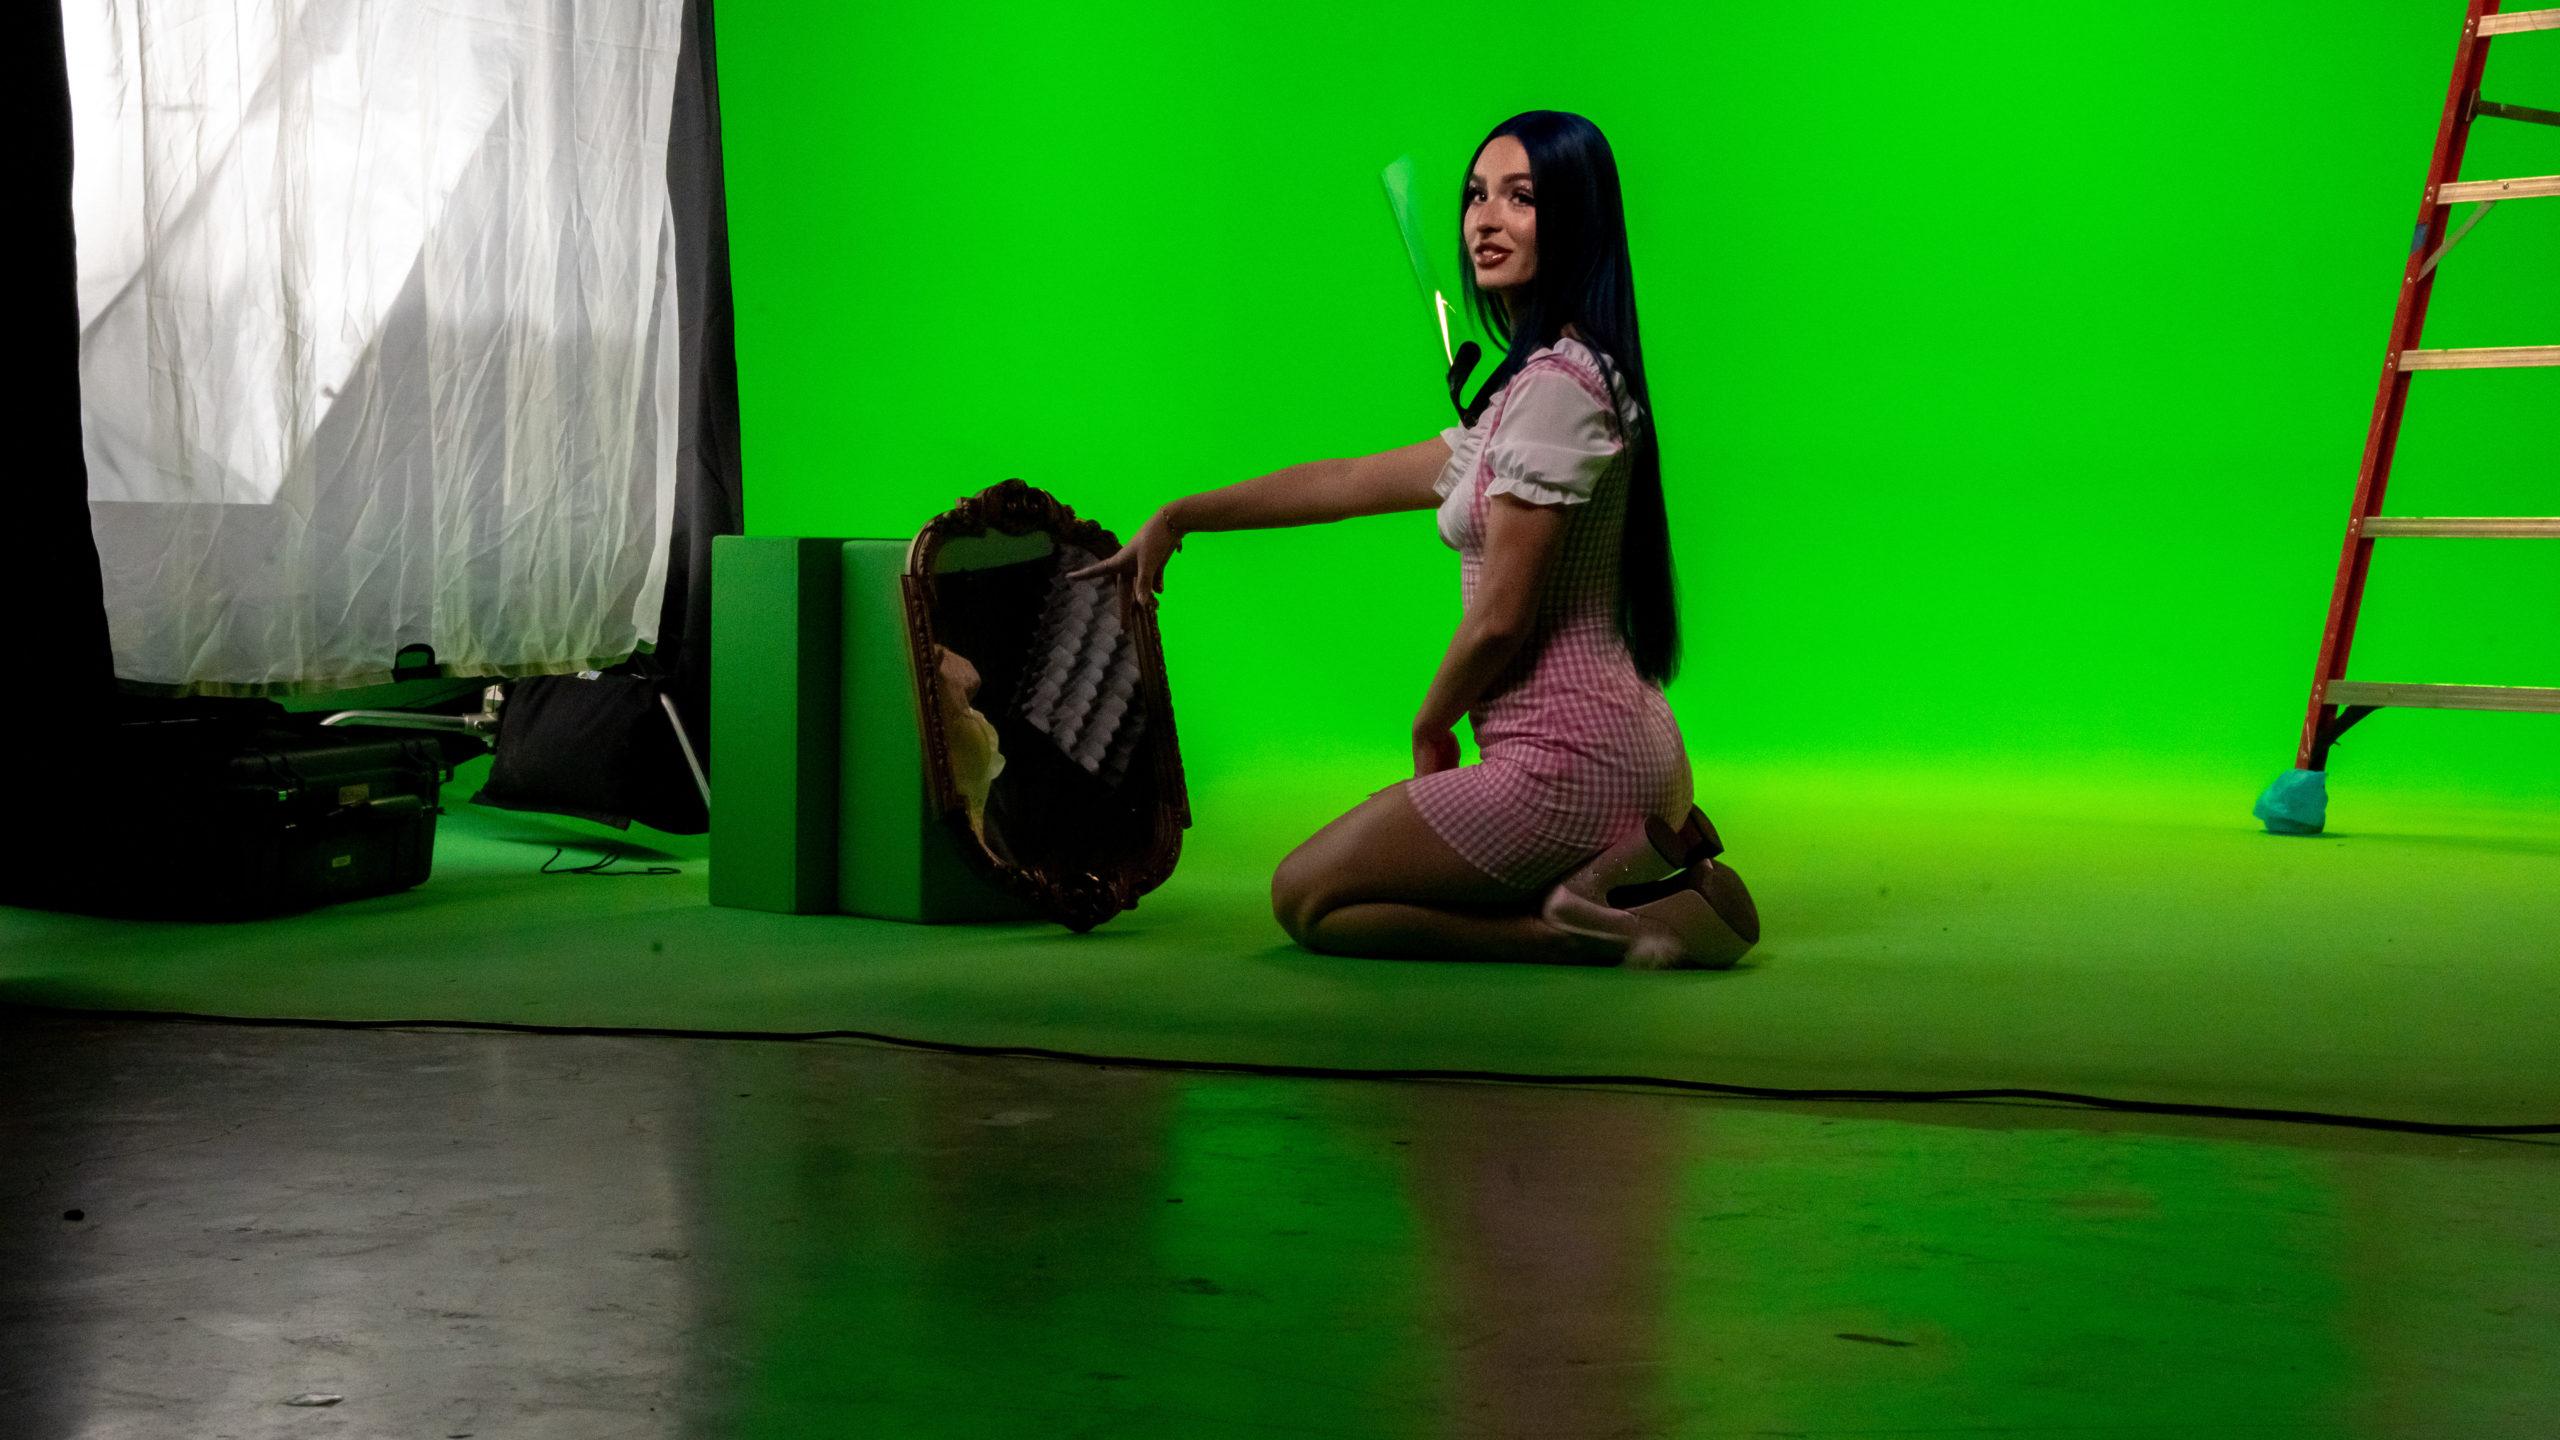 Greenscreen video shoot mirror